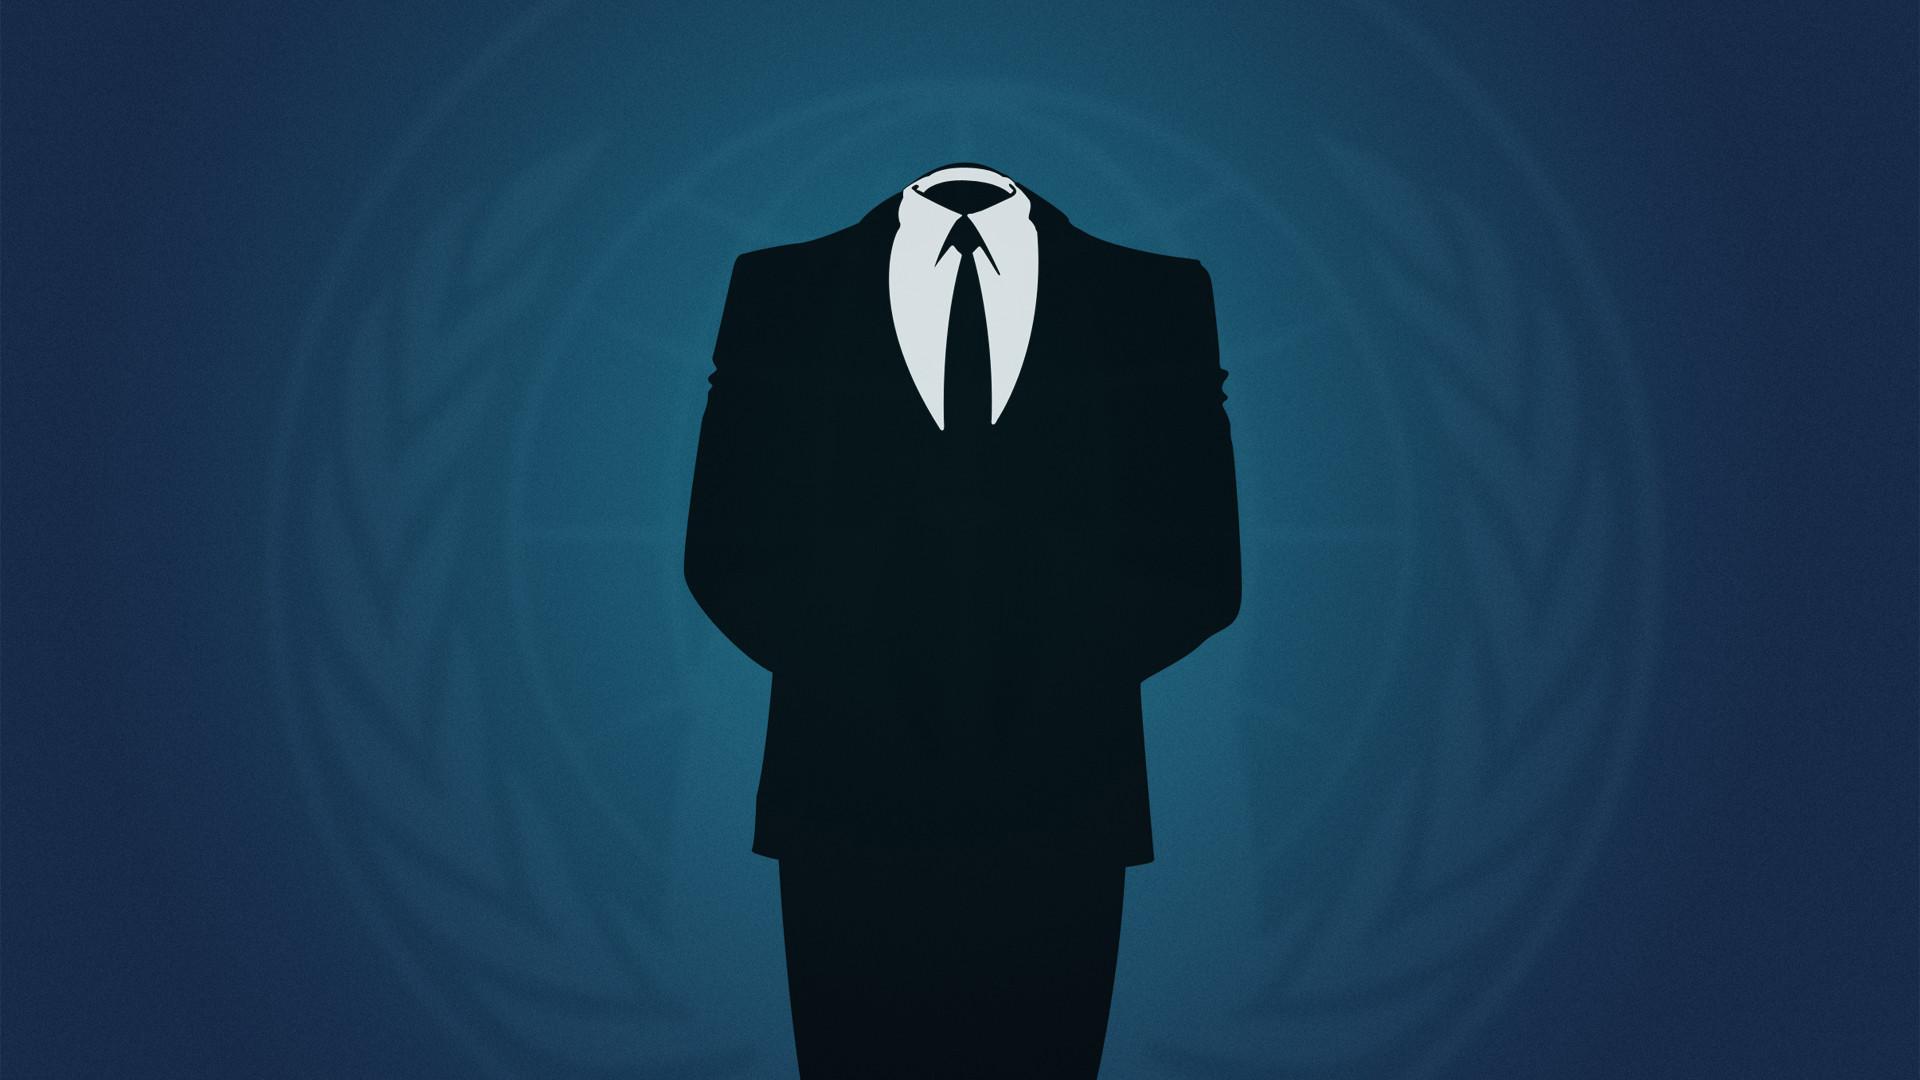 Anonymous Full HD Wallpaper